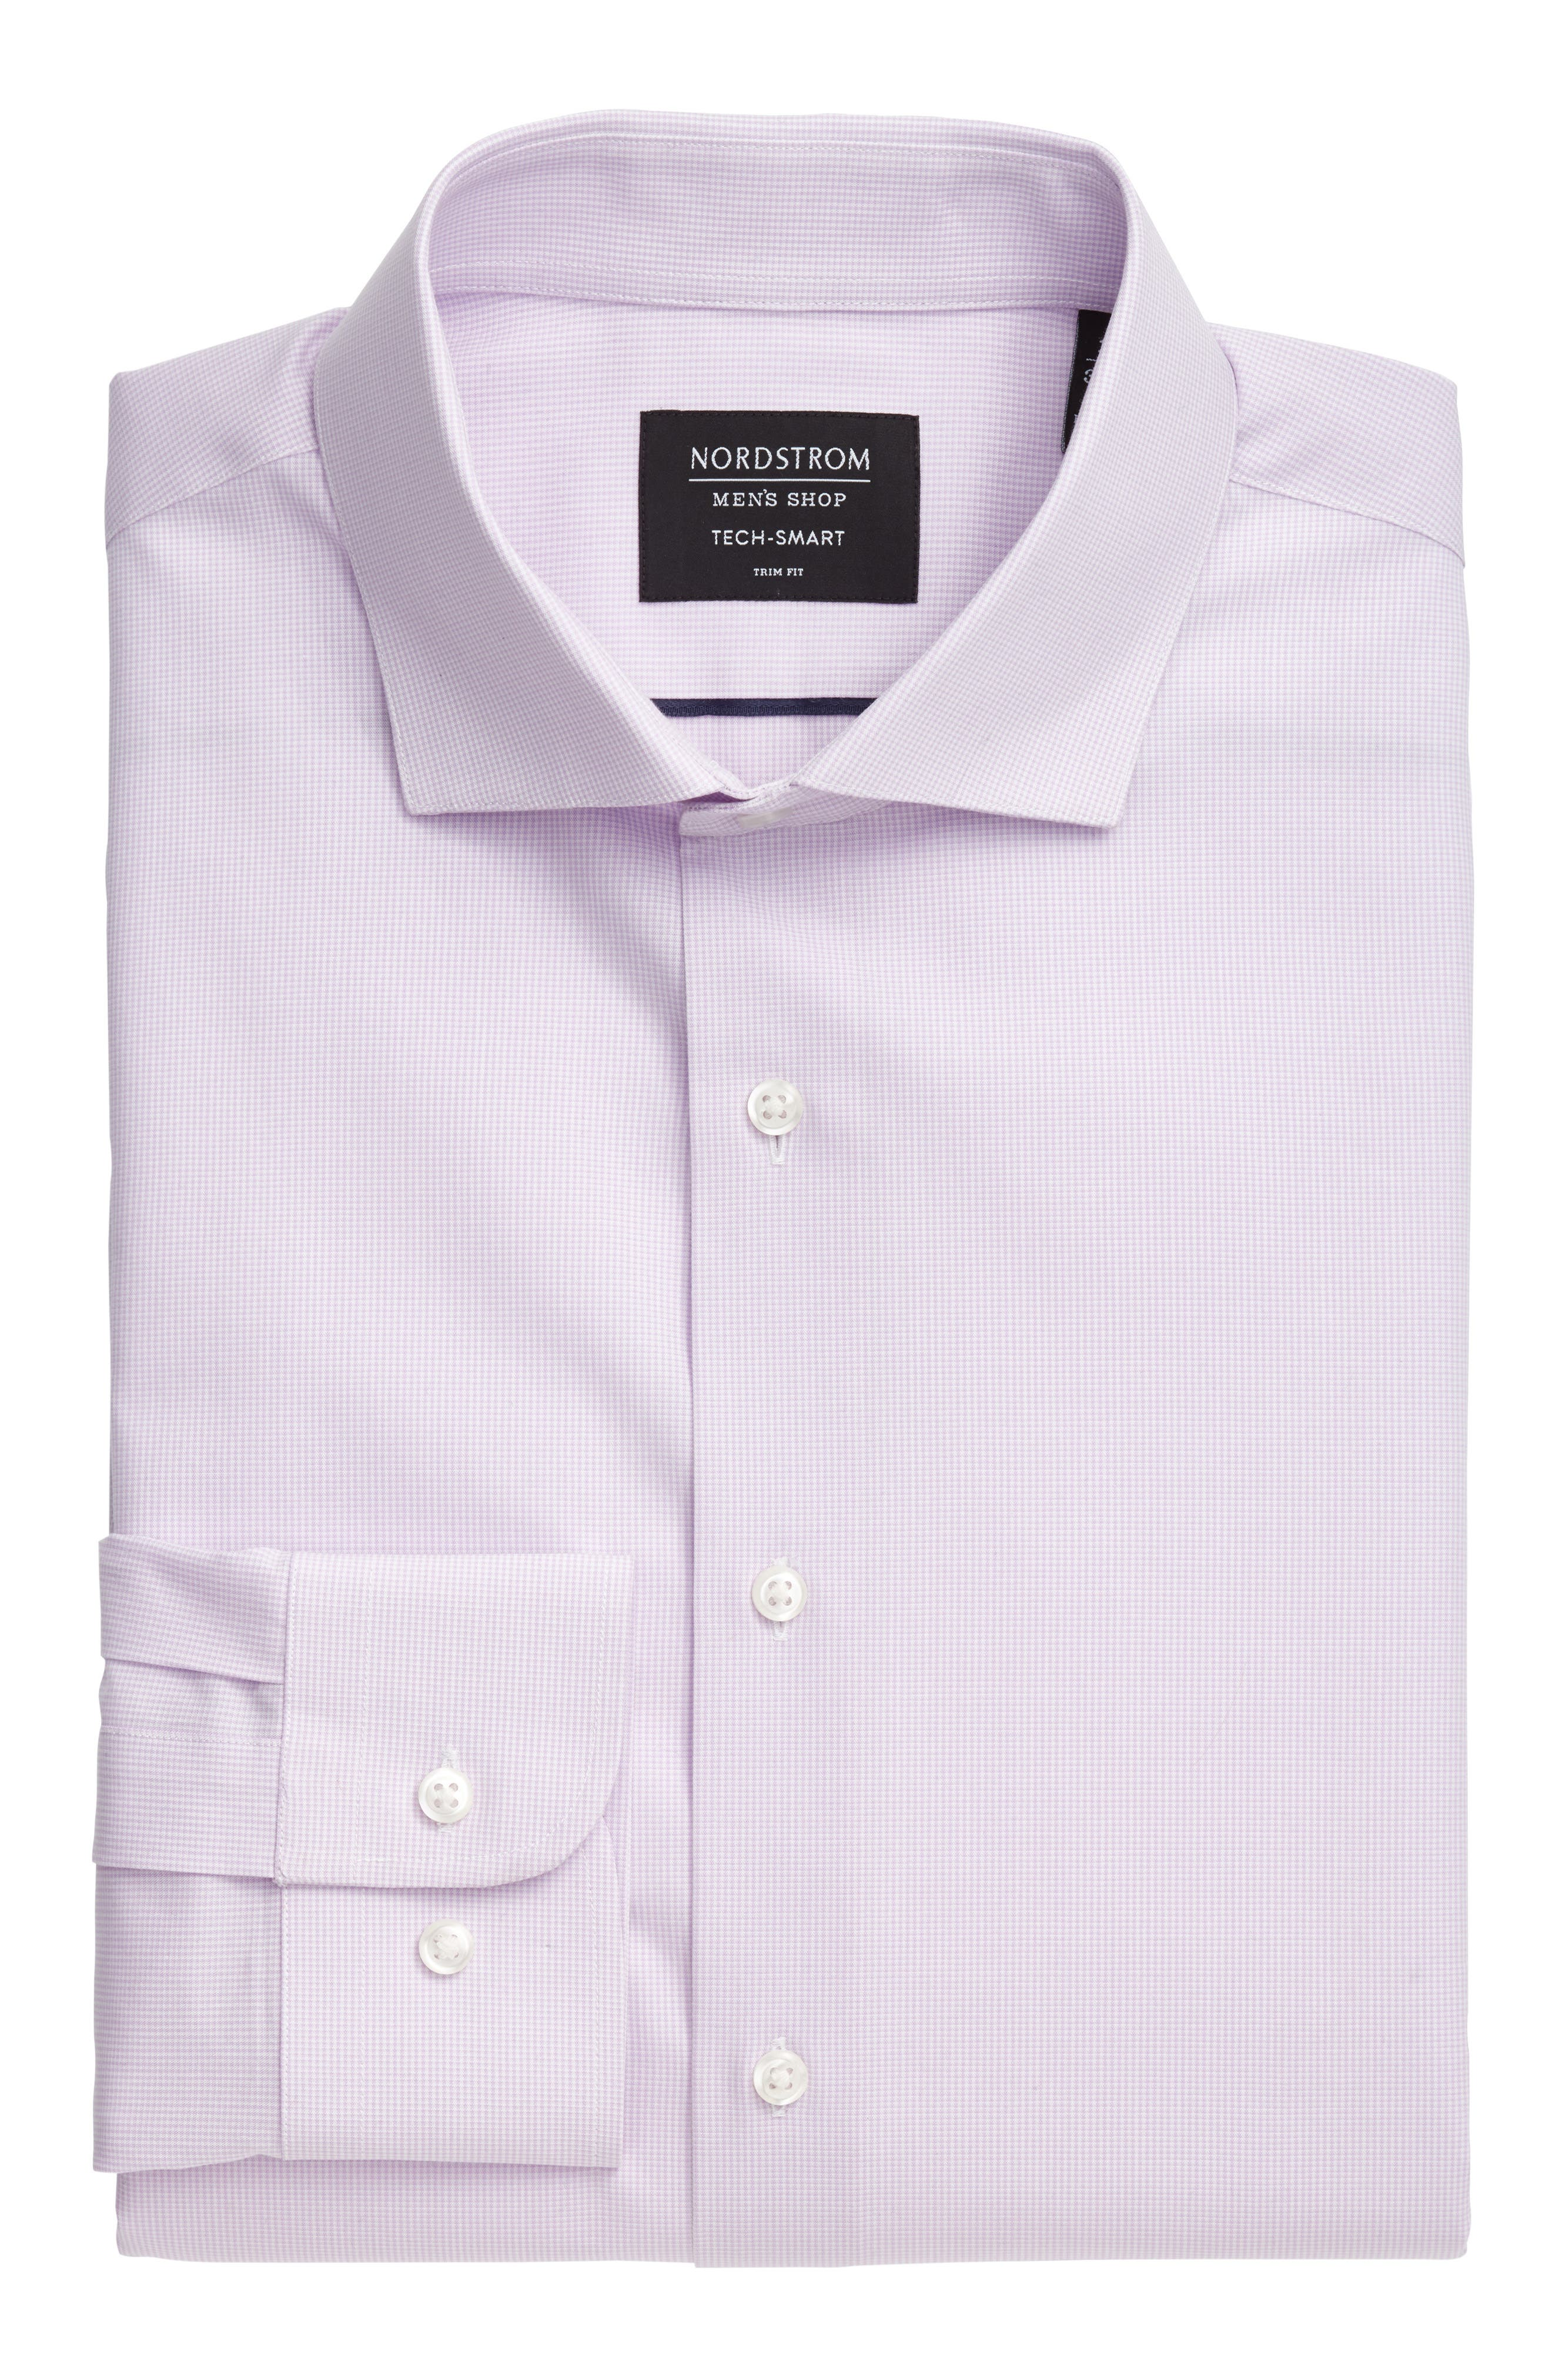 Nordstrom Men's Shop Tech-Smart Traditional Fit Micro Check Dress Shirt